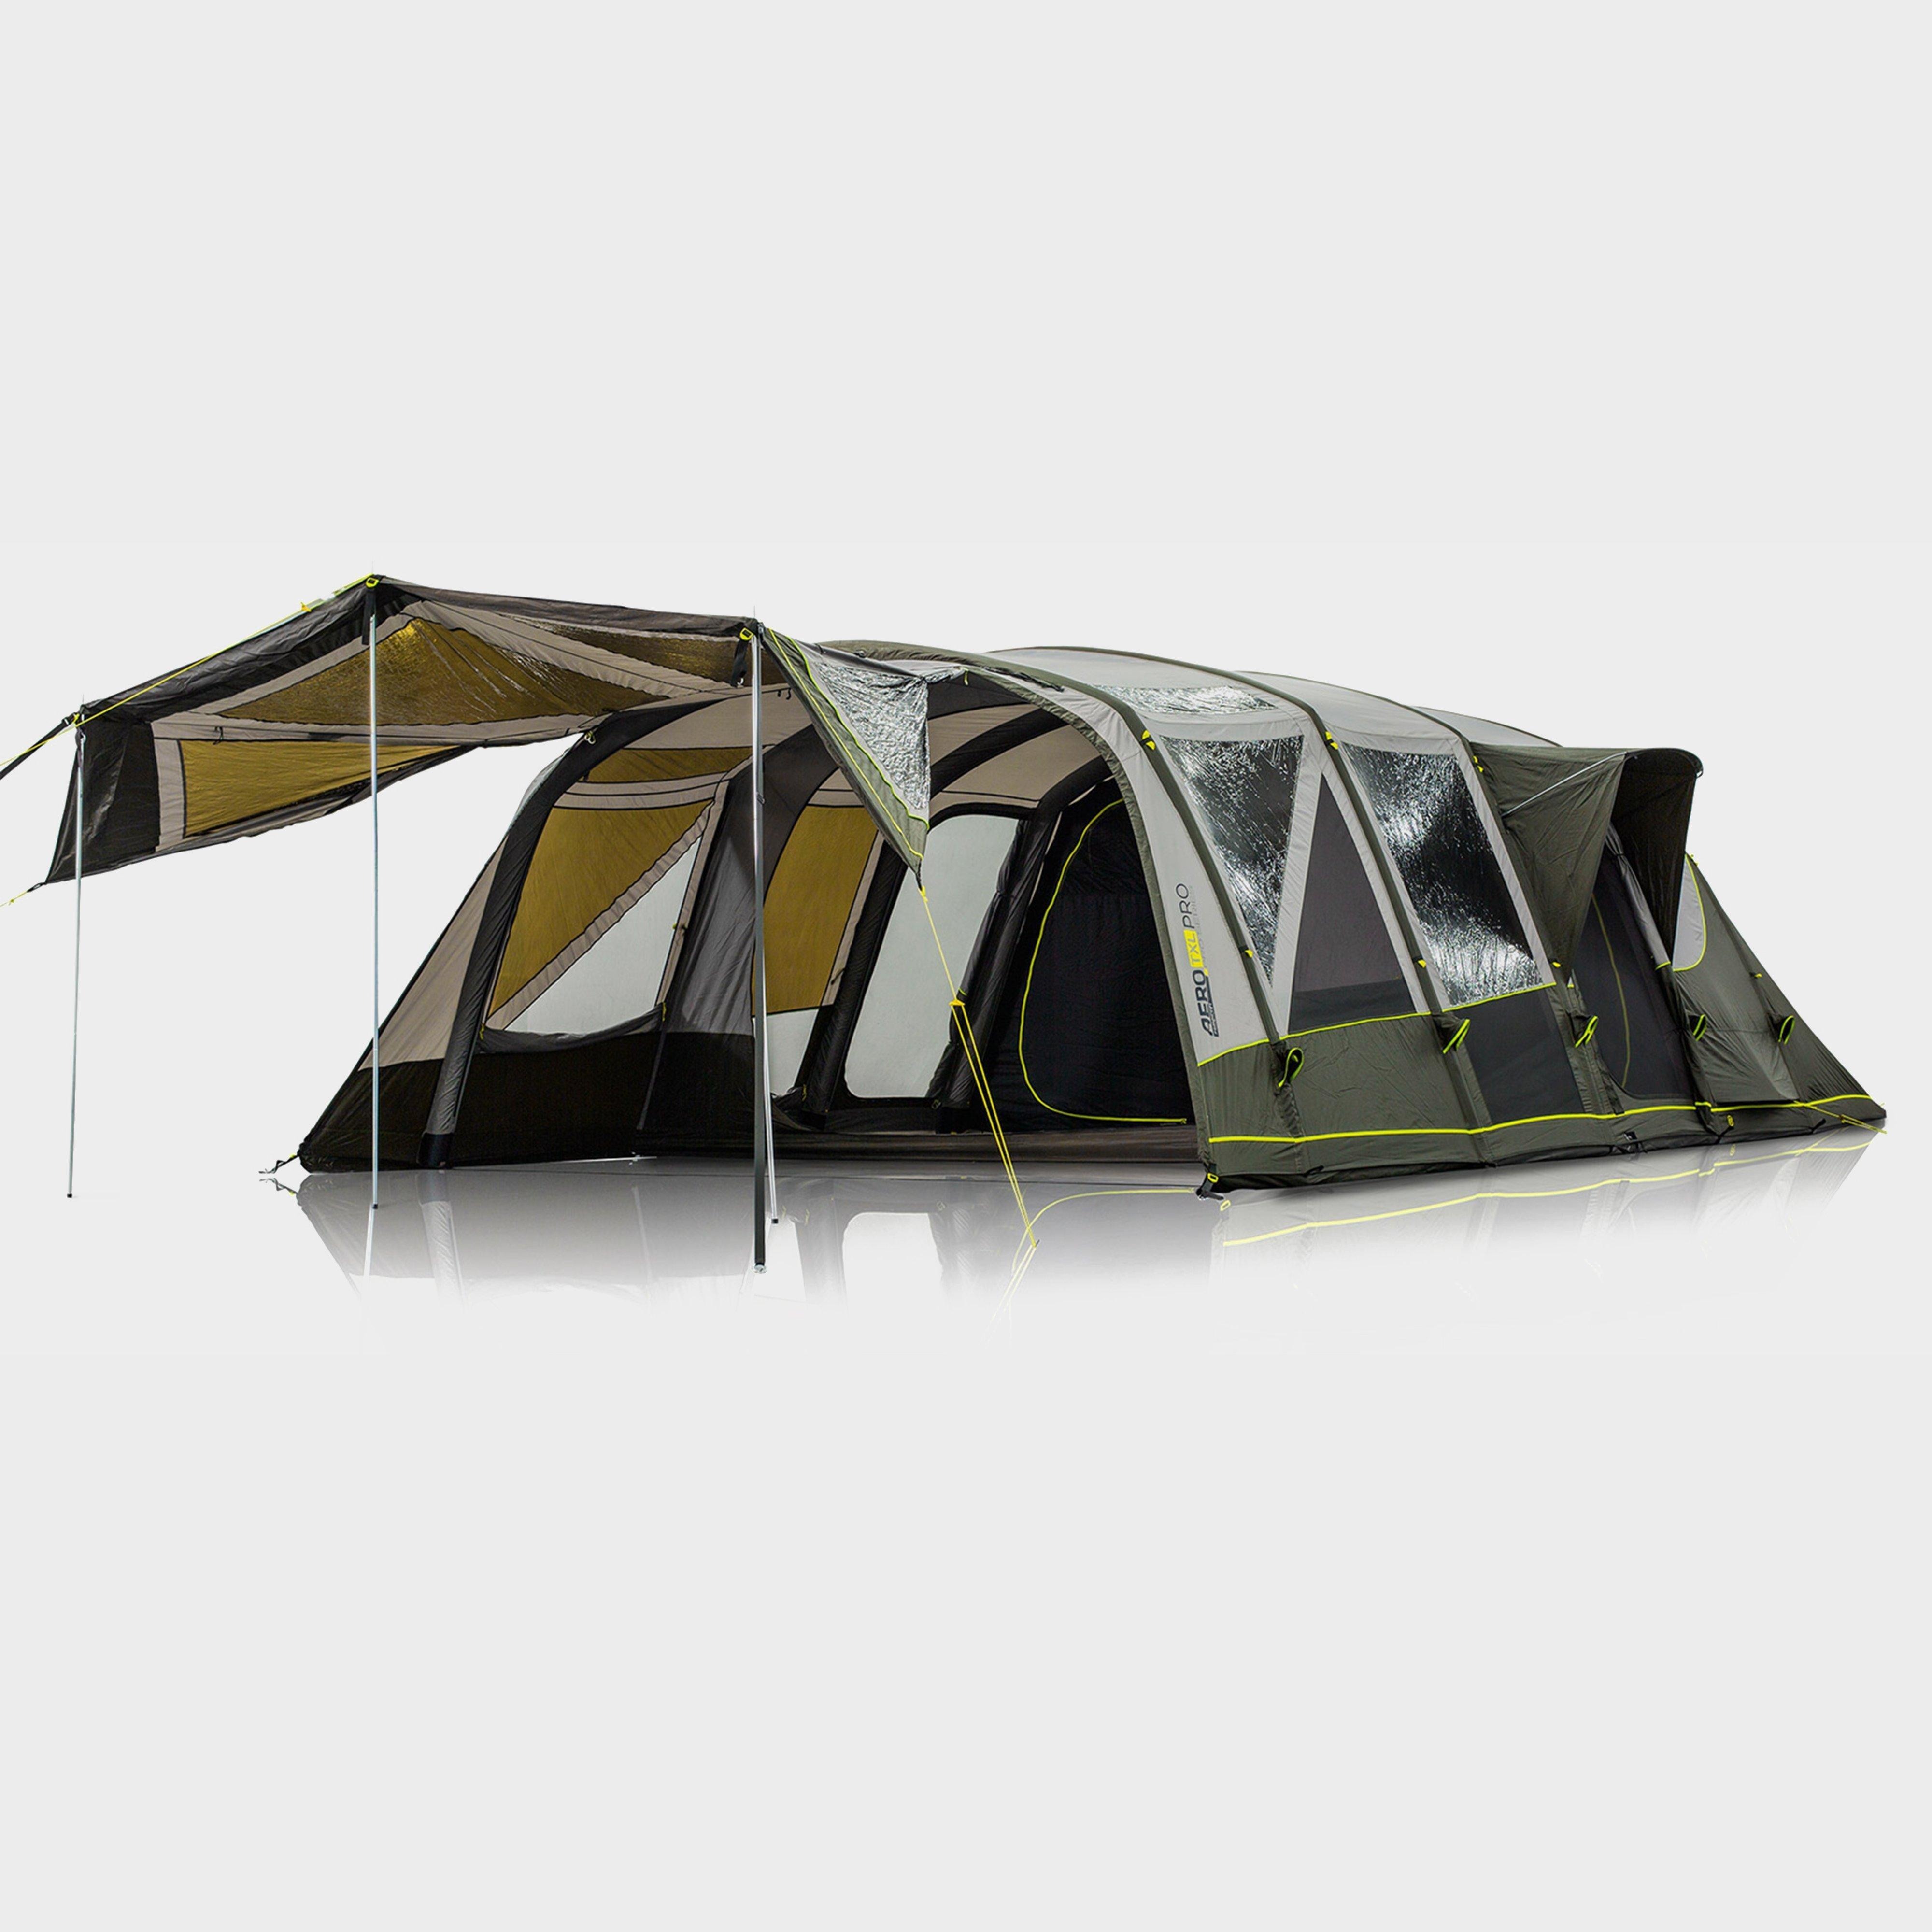 Zempire Aero TXL Pro Tent